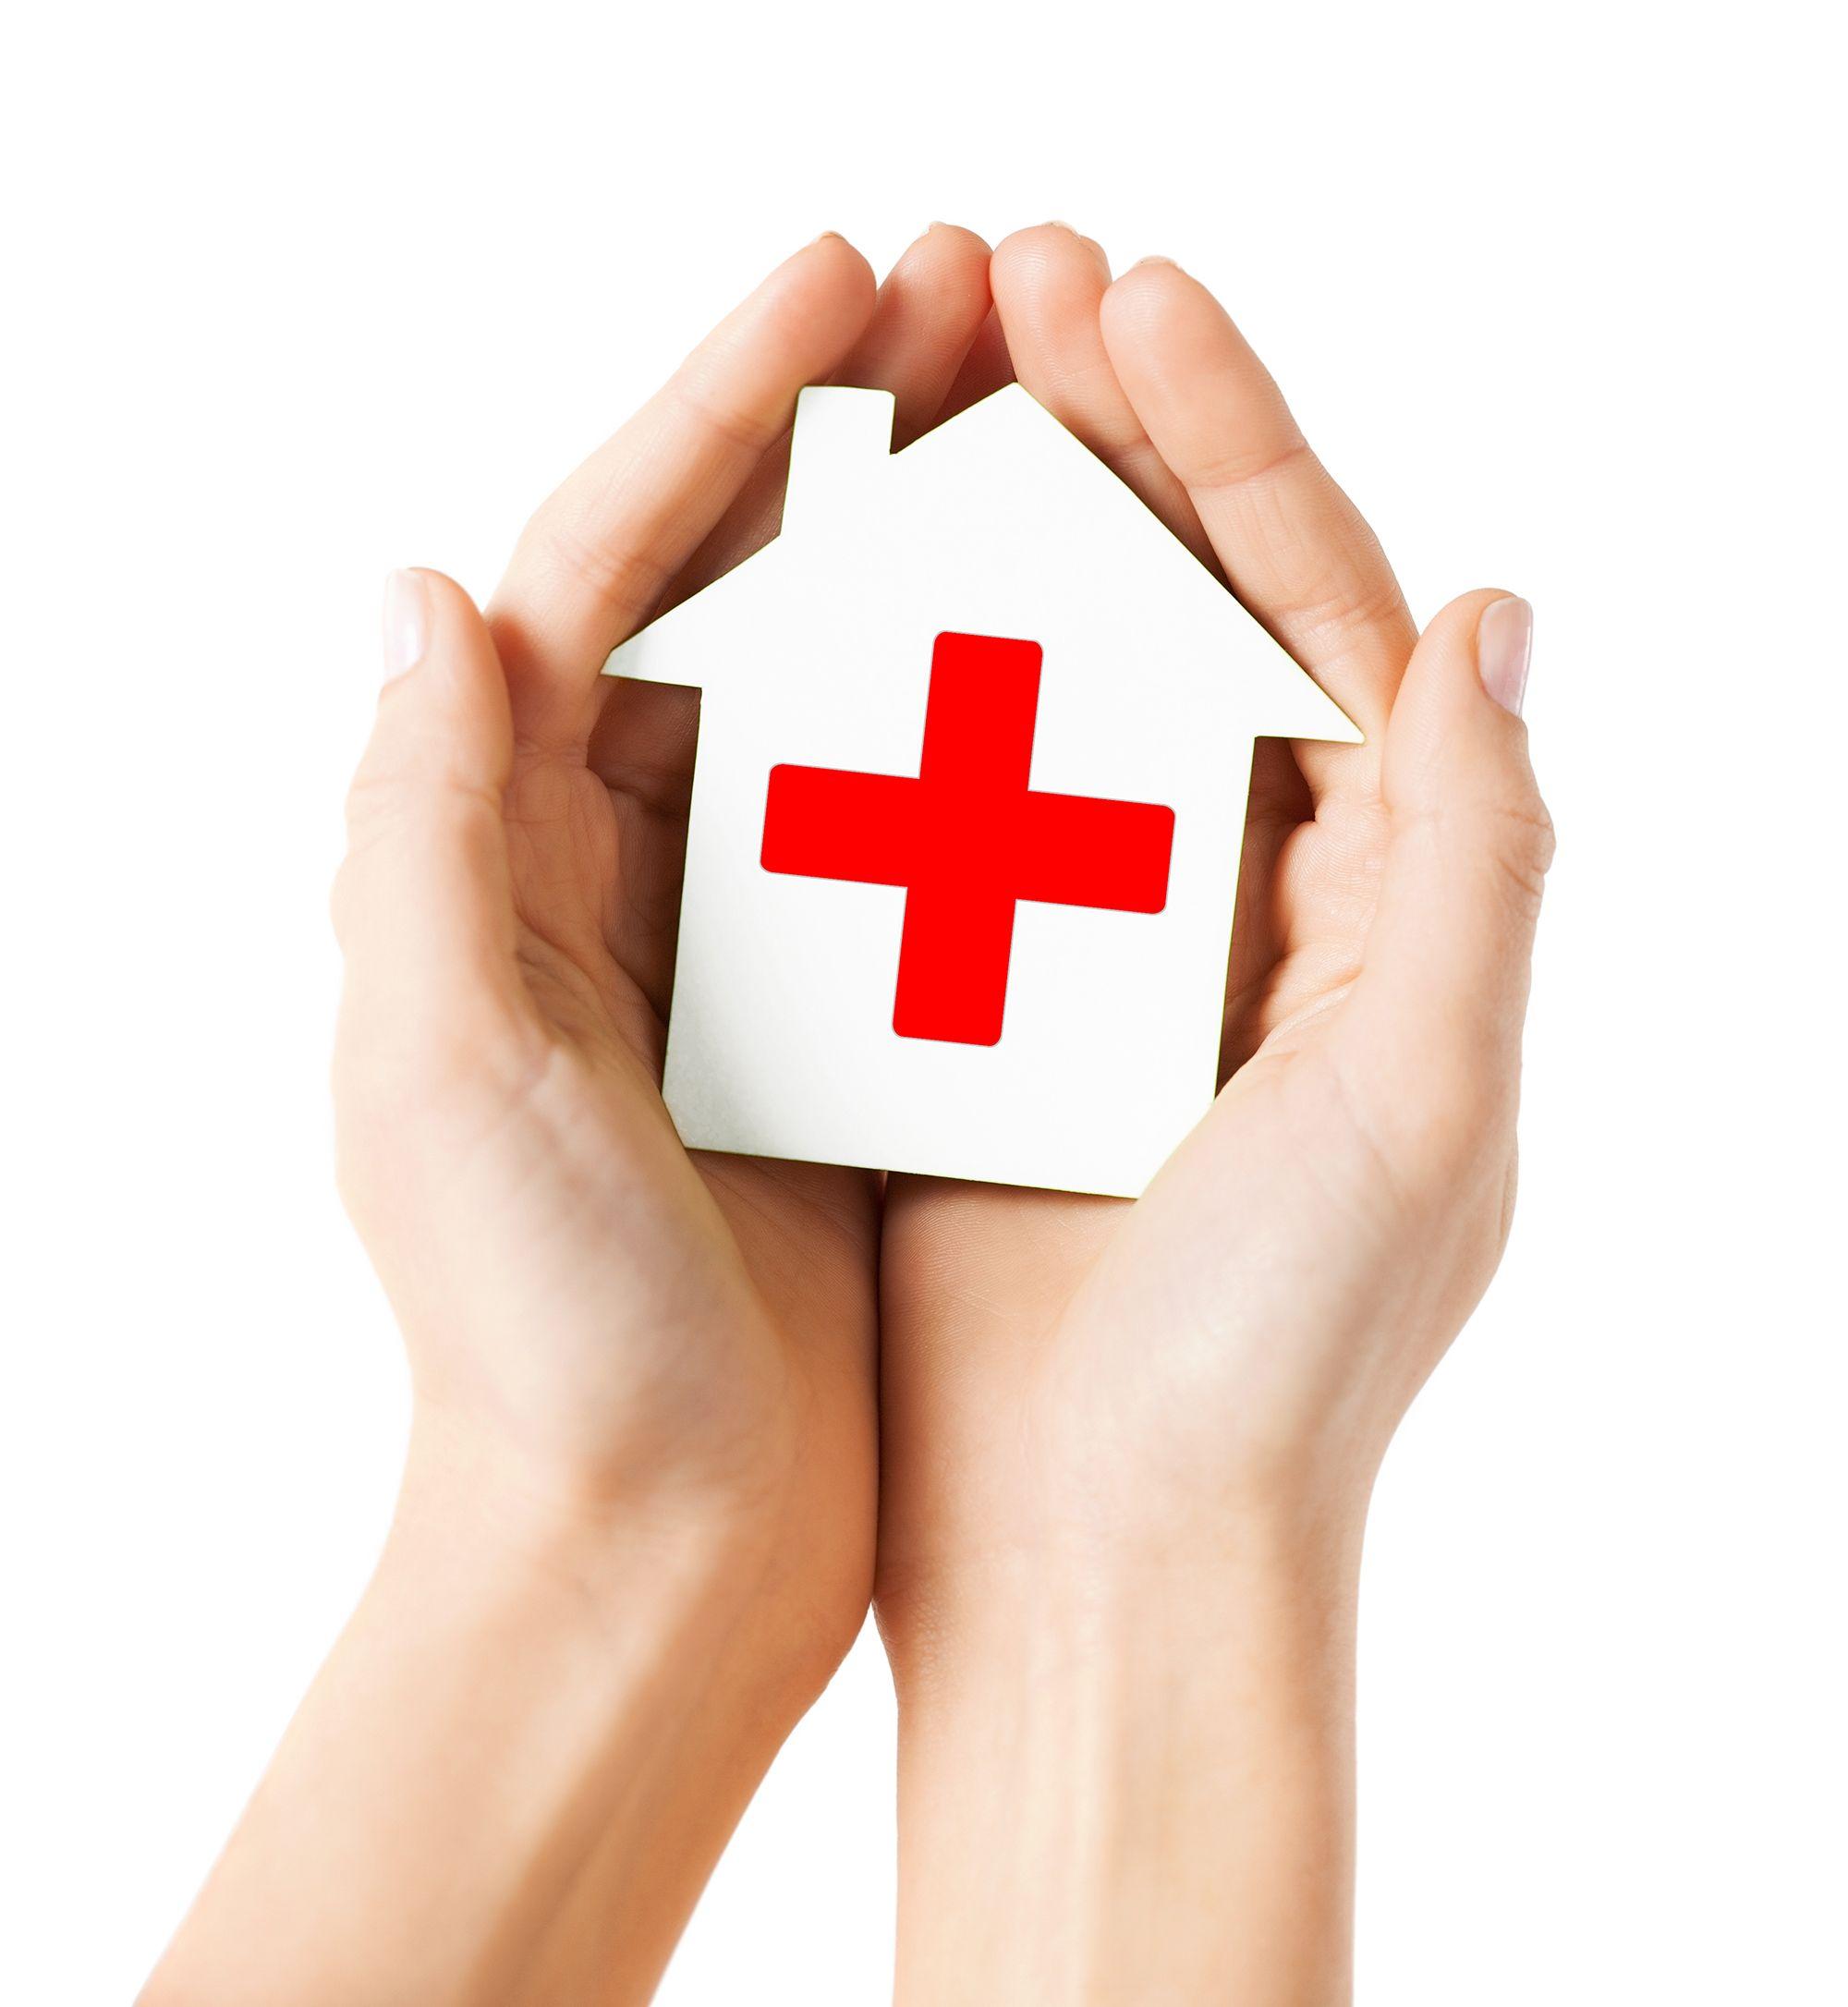 Brief Job Description For Home Health Aide Personnel Home Care